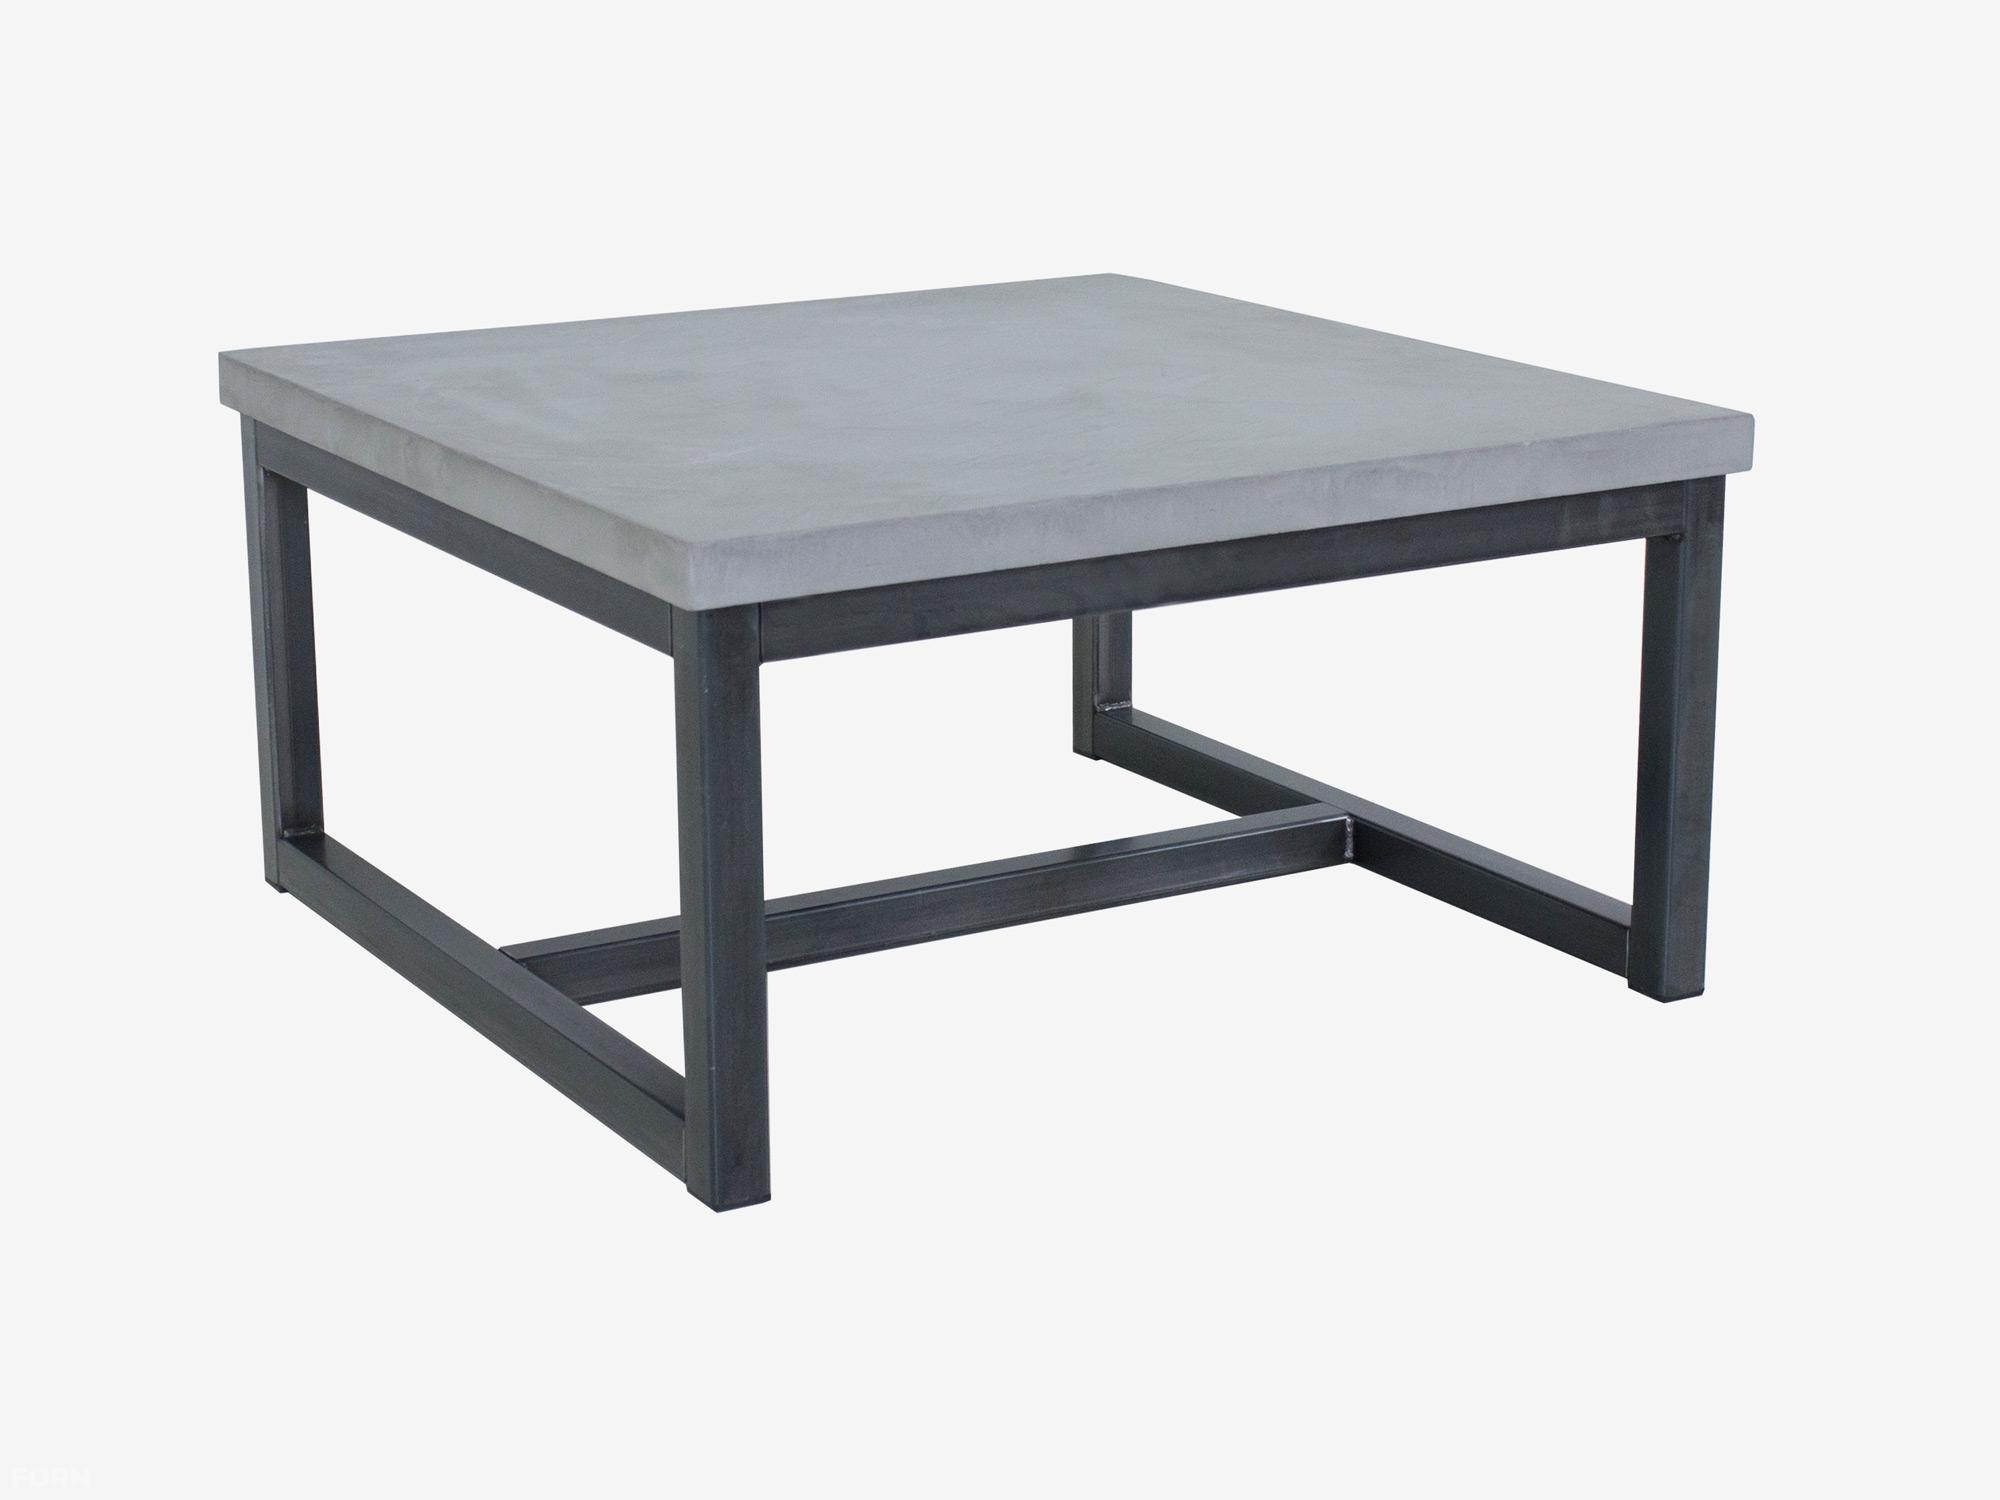 Salon Tafel Staal.Industriele Salontafel Betonlook Max